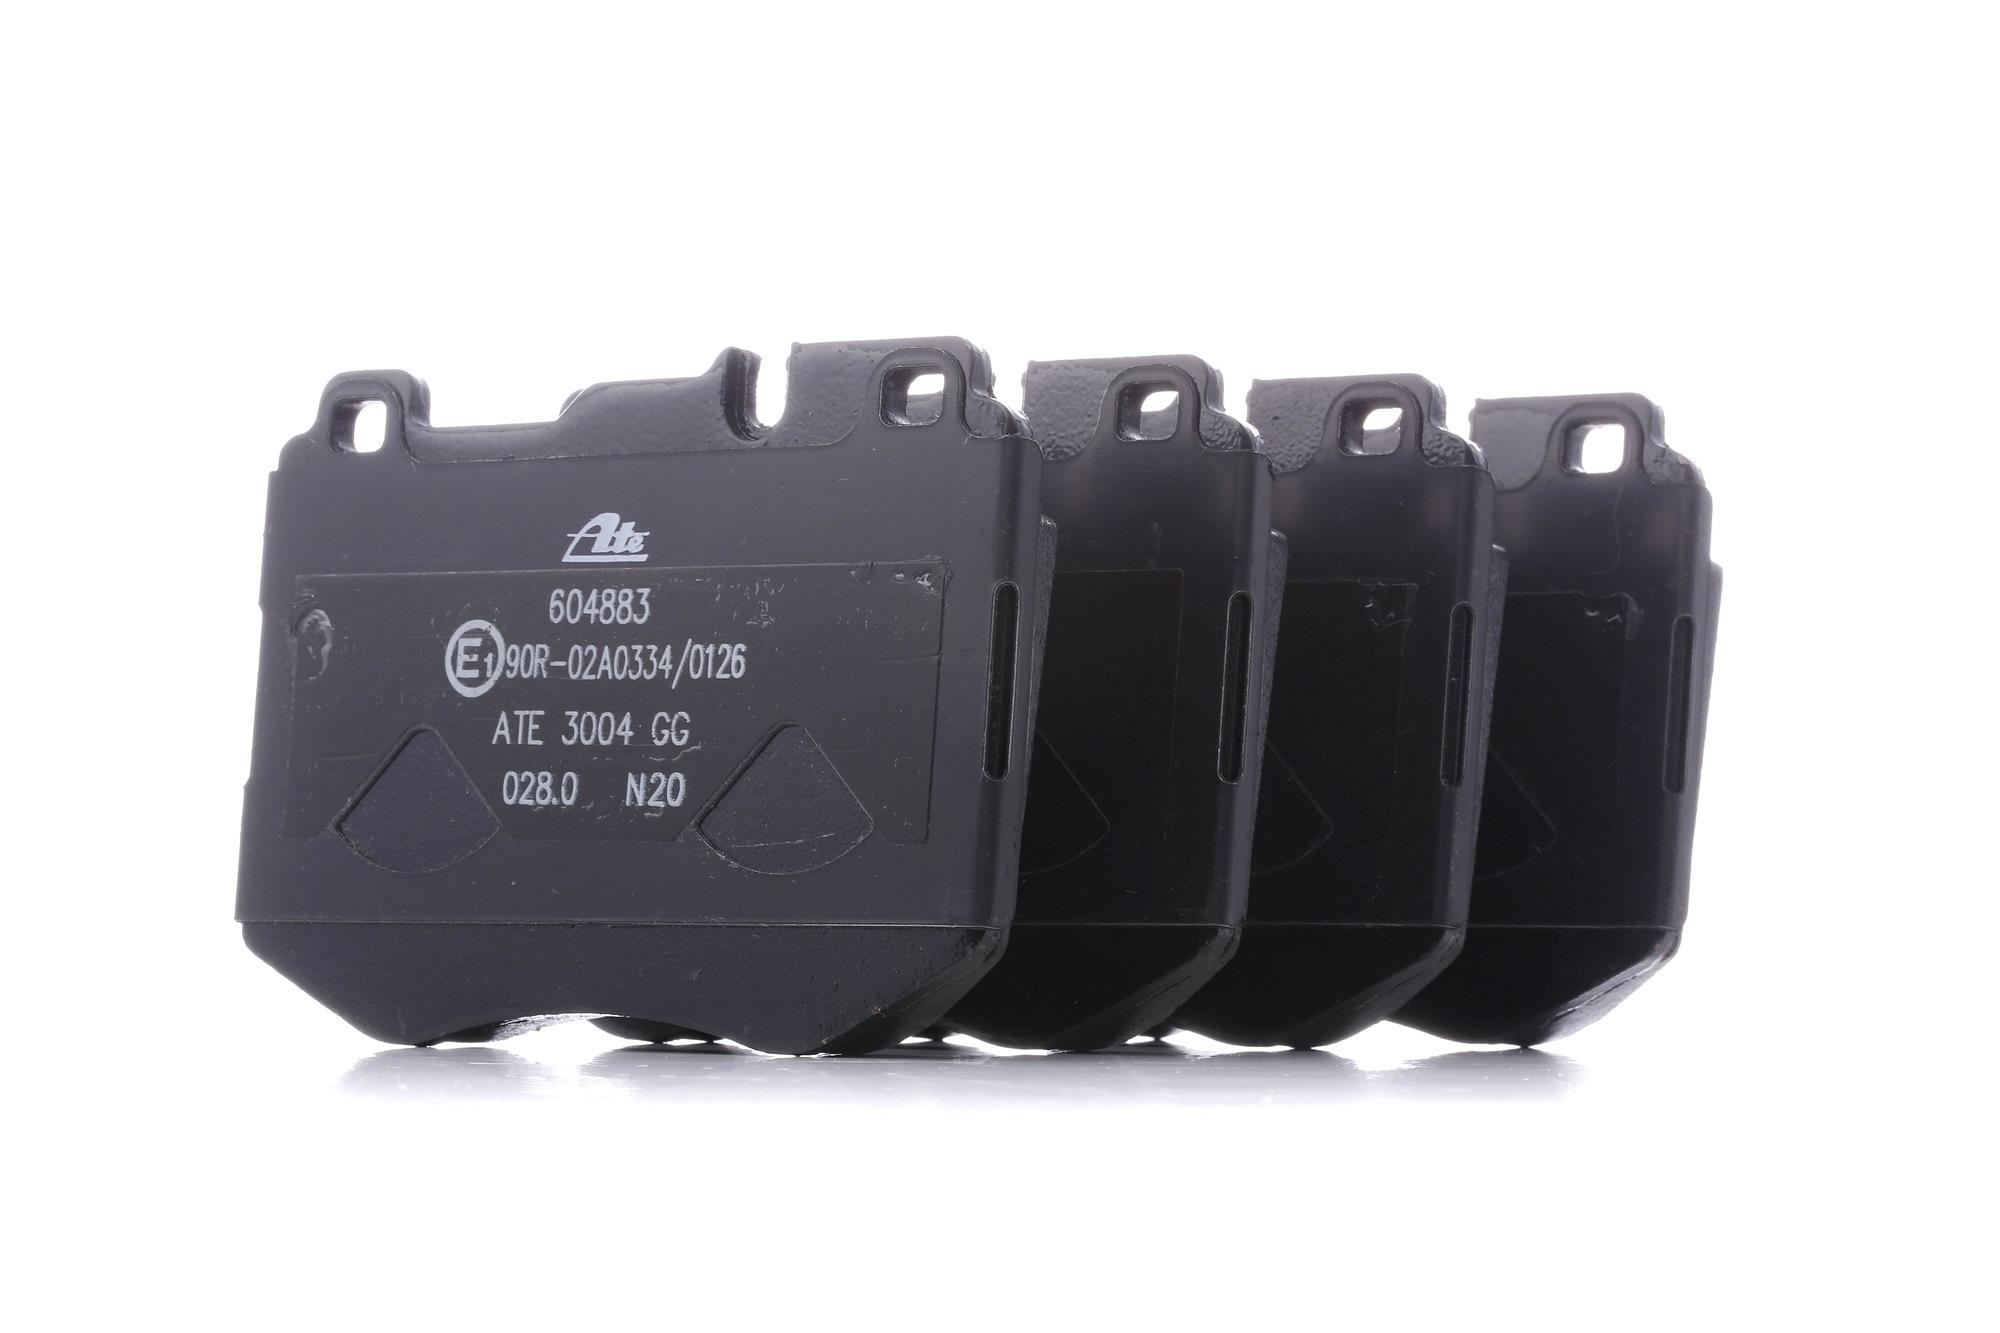 MERCEDES-BENZ CLS 2014 Tuning - Original ATE 13.0460-4883.2 Höhe: 92,1mm, Breite: 127,5mm, Dicke/Stärke: 18,7mm